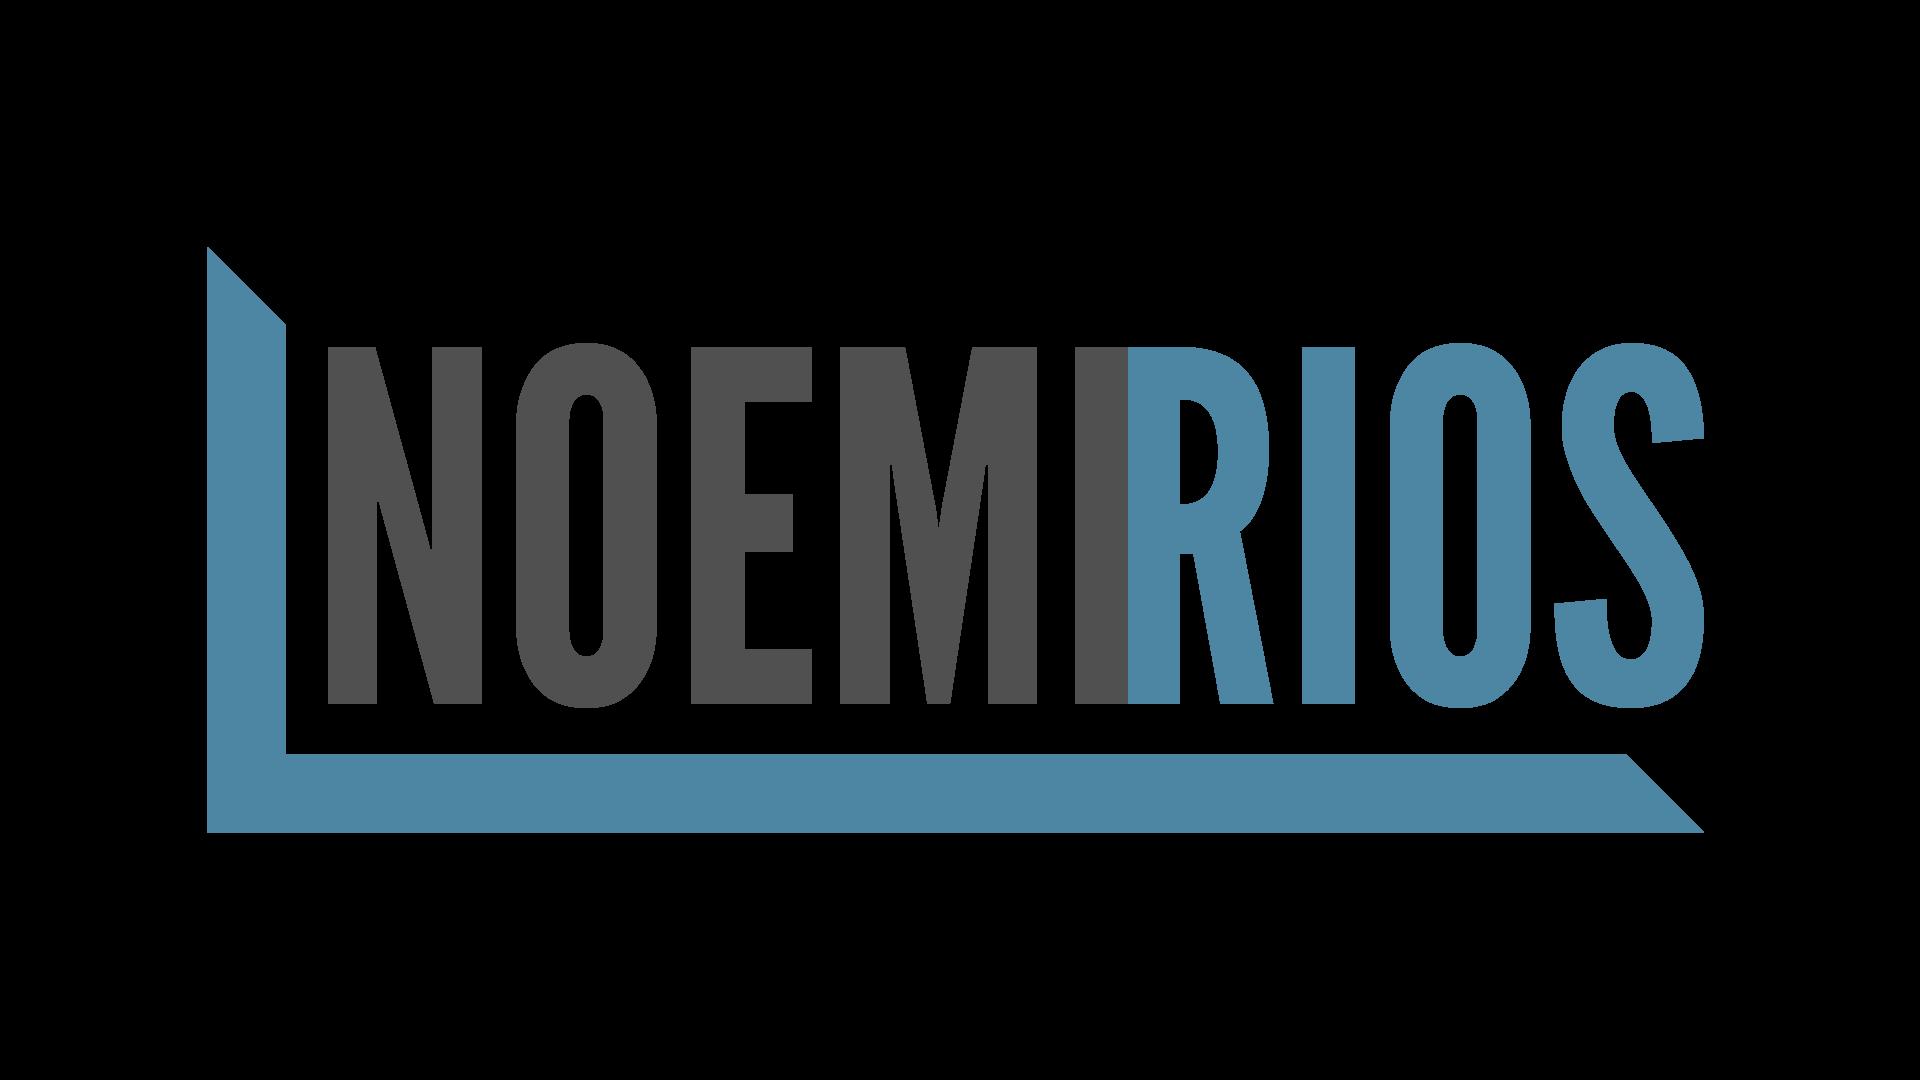 Noemi Rios